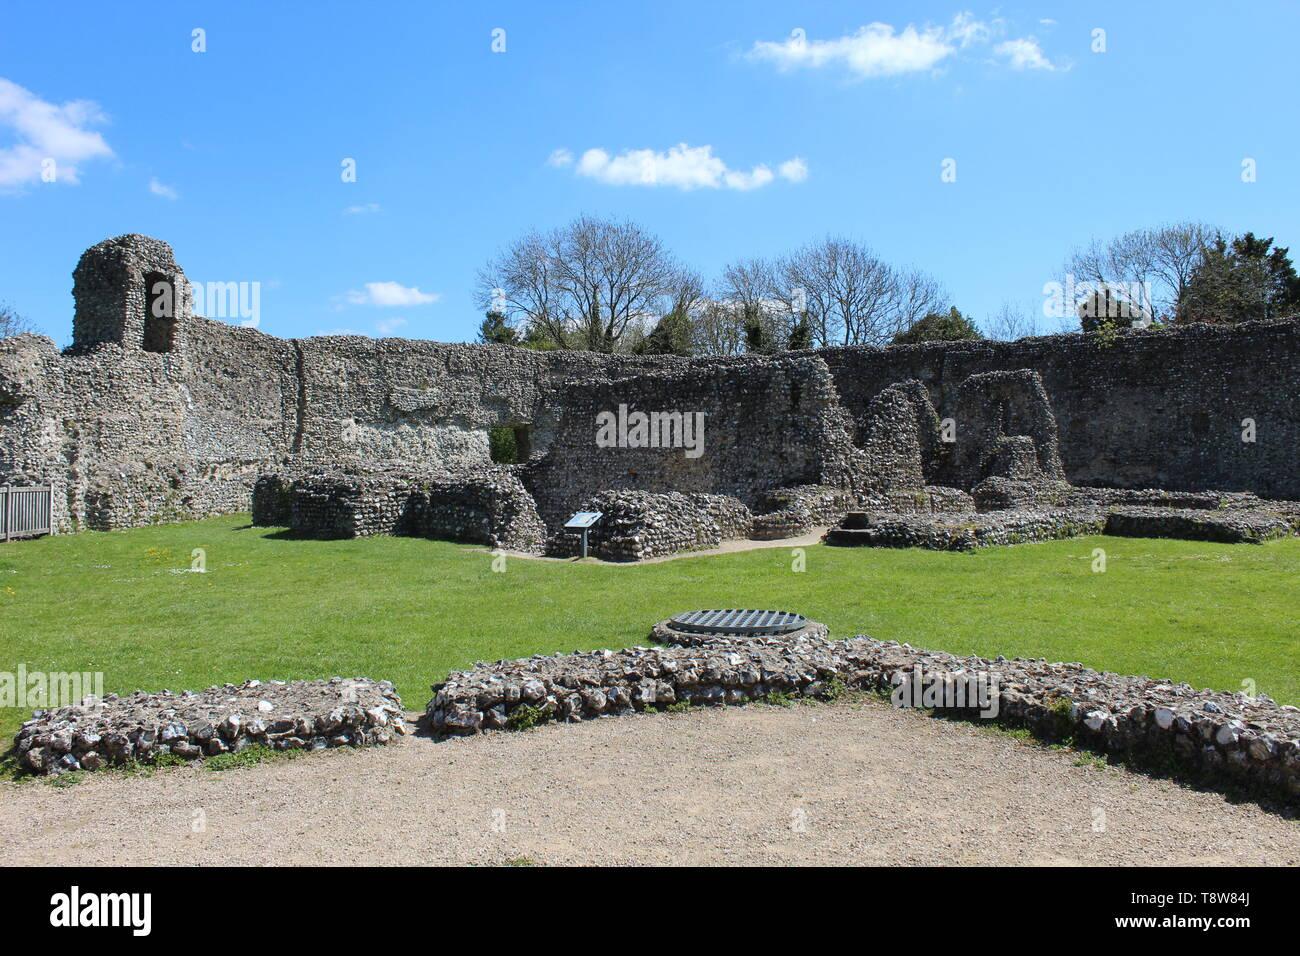 Eynsford castle #5 - Stock Image